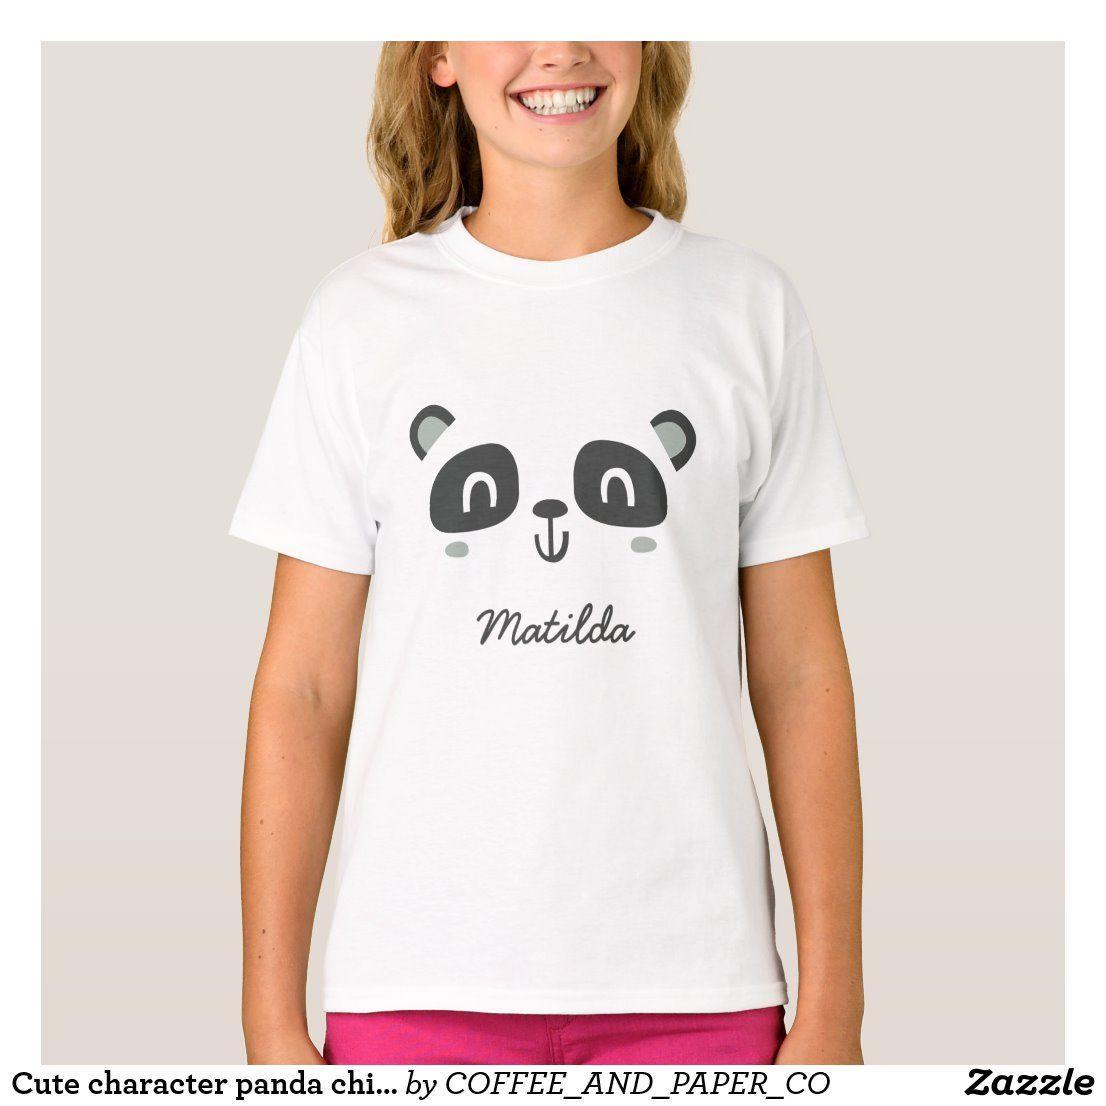 Cute character panda childrens birthday apparel TShirt  apparel